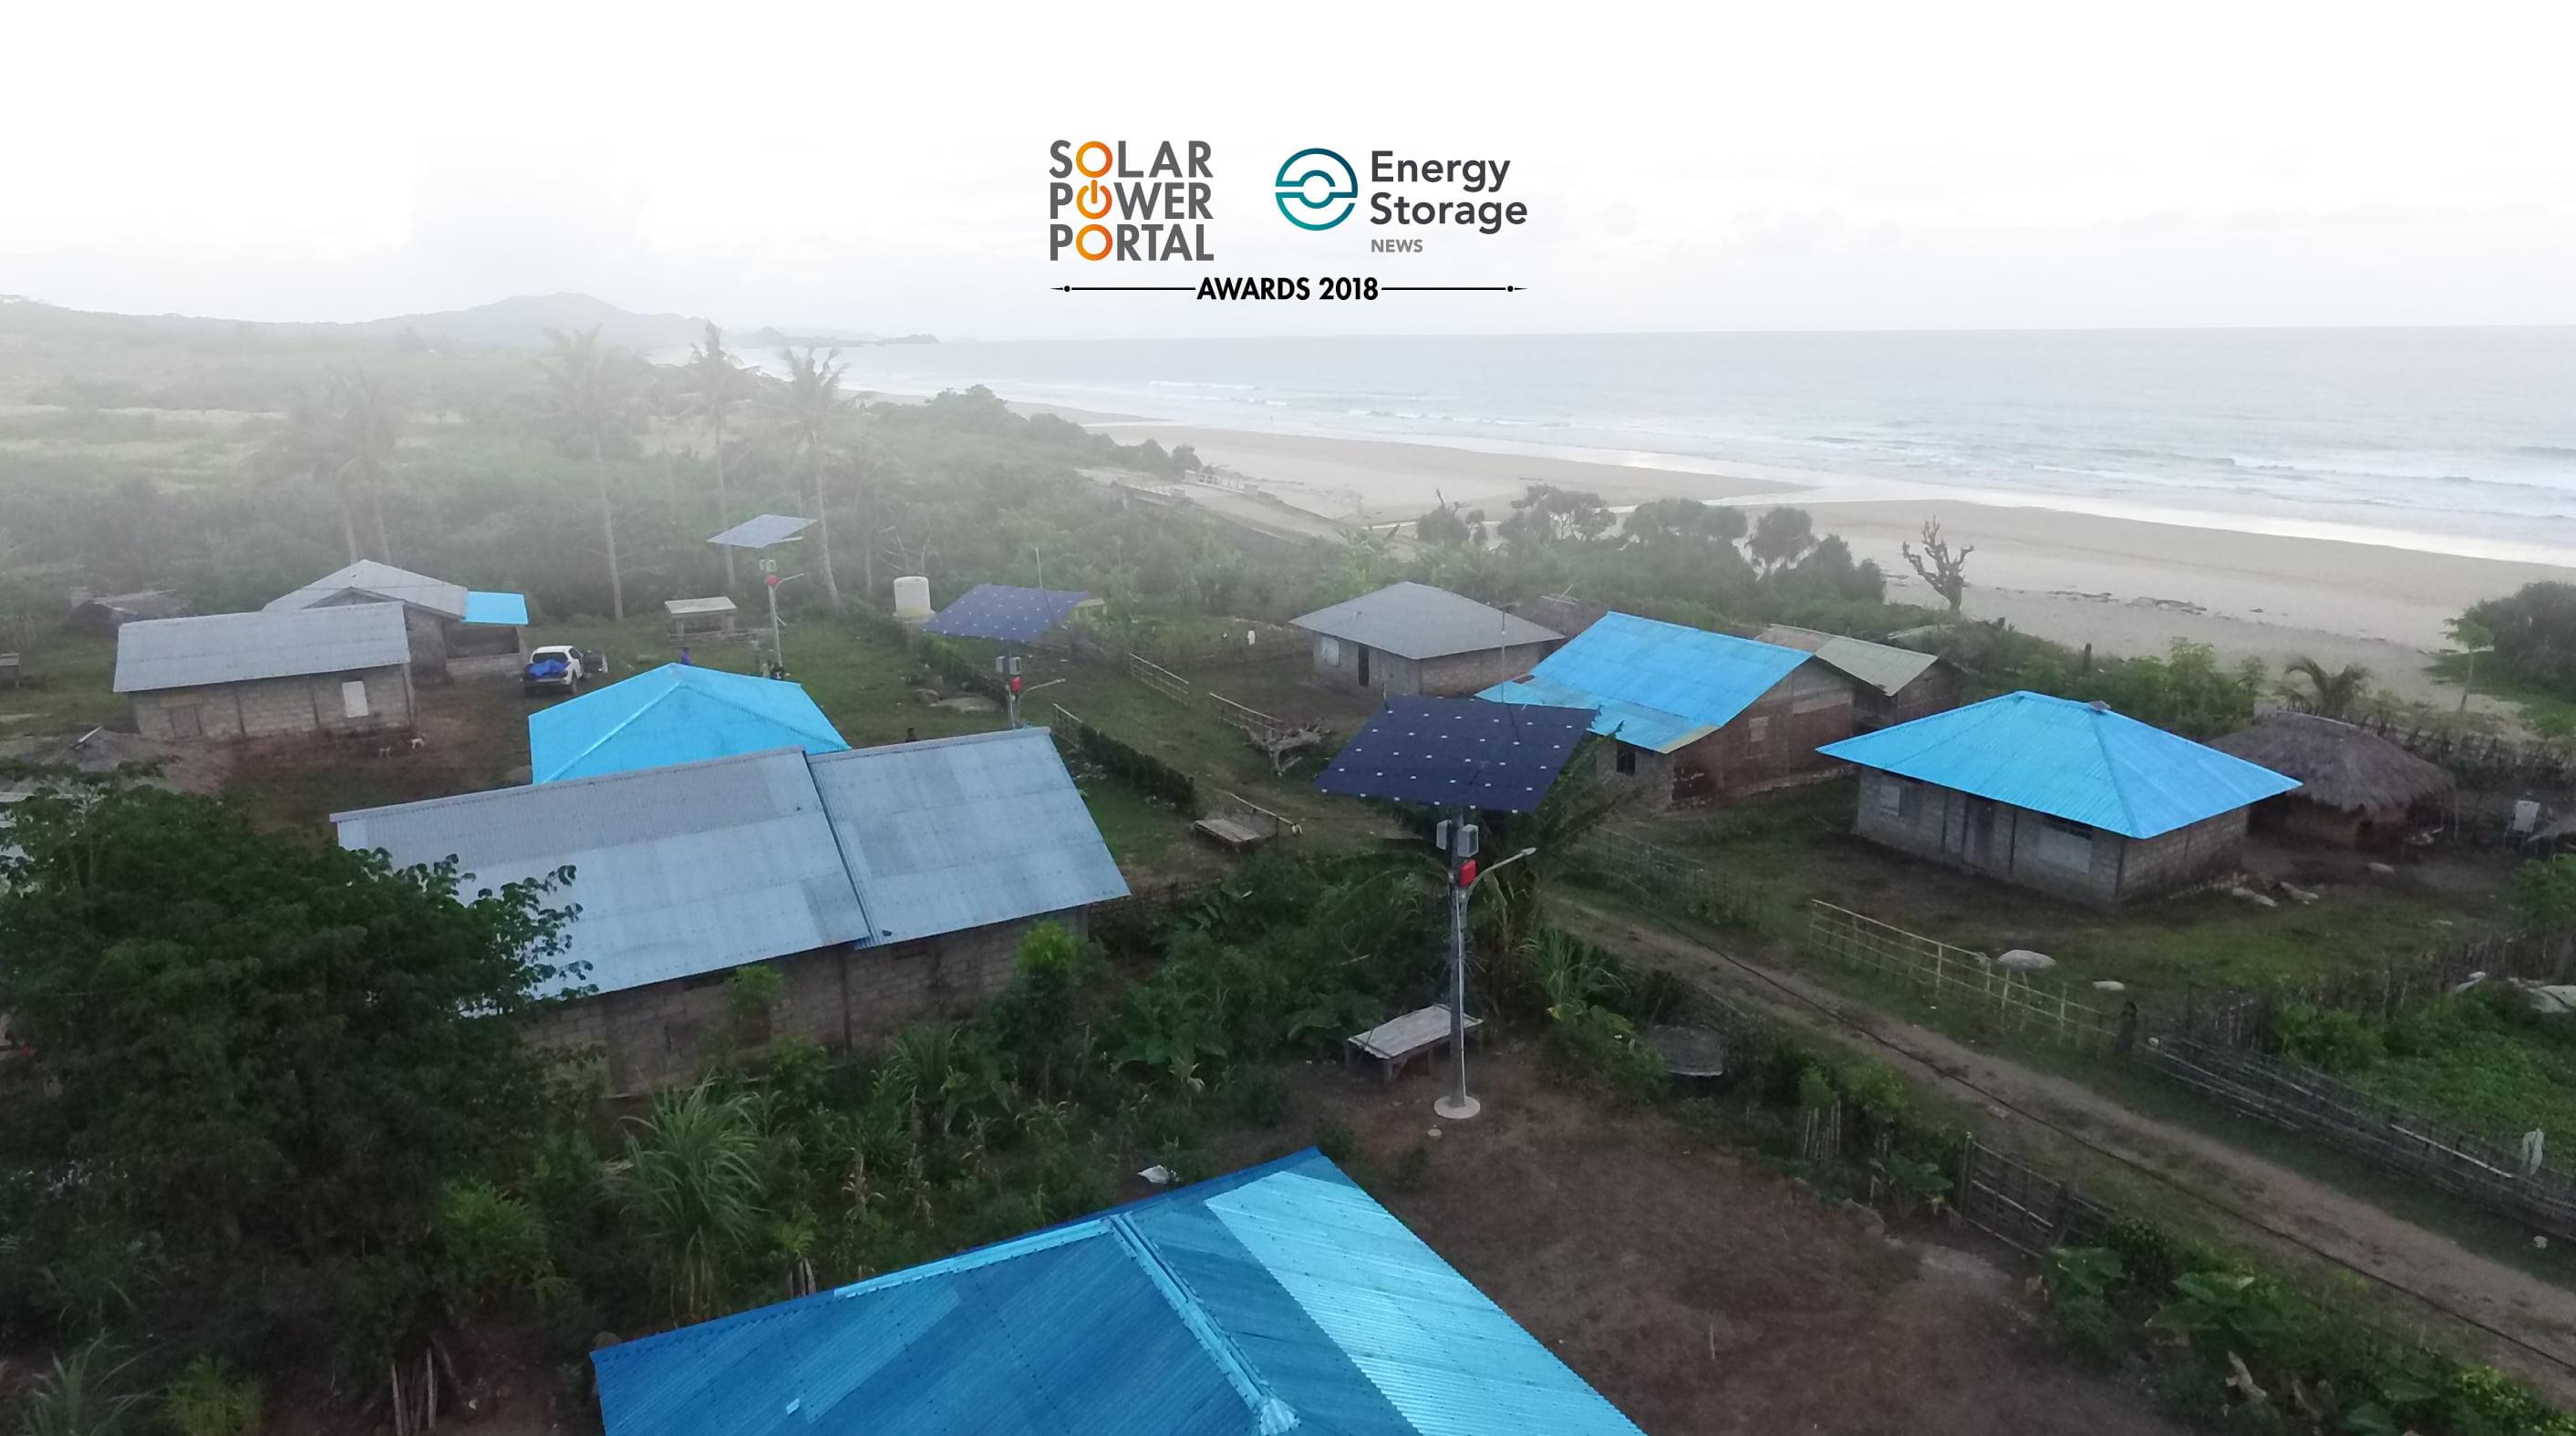 Solar-Power-Awards-2018-homepage-banner-2